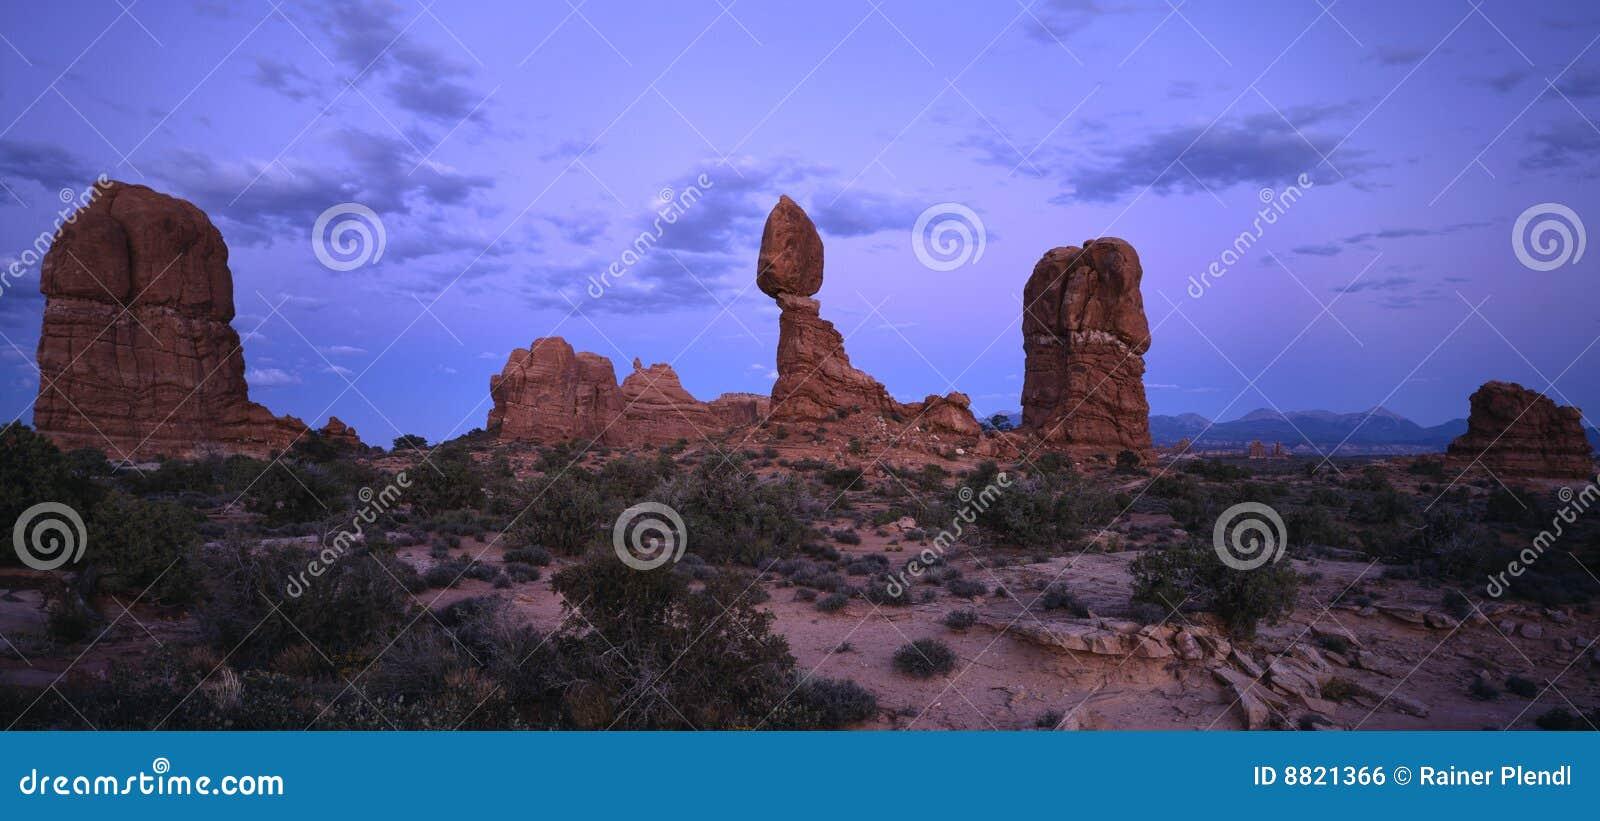 Balanced rock sunset